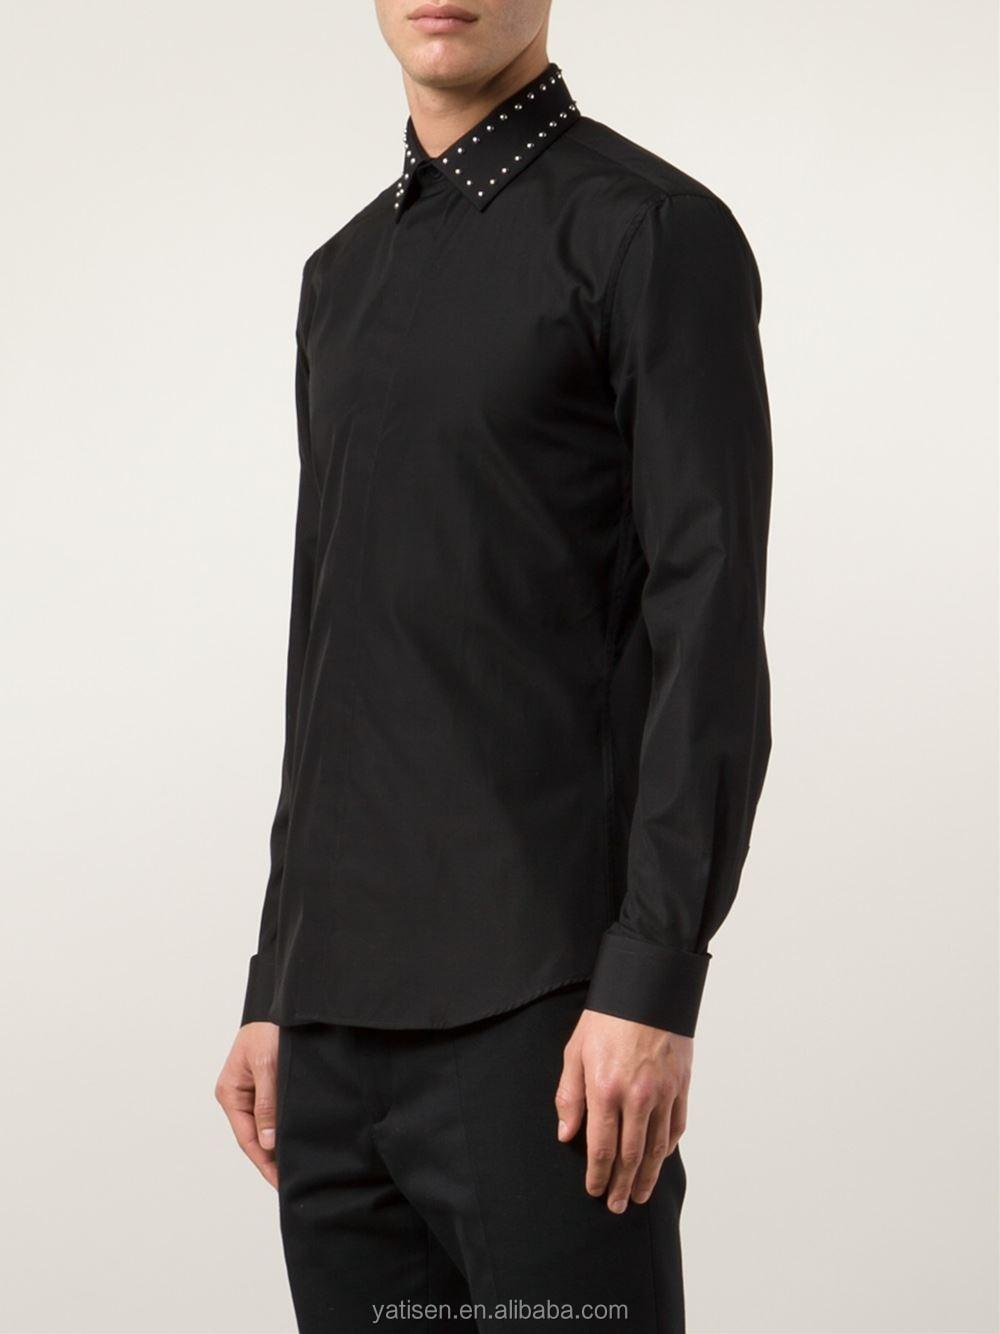 Shirt design for man 2016 - 2016 New Design For Man Black Plain Shirts For Man Custom Shirts With Shining Collars